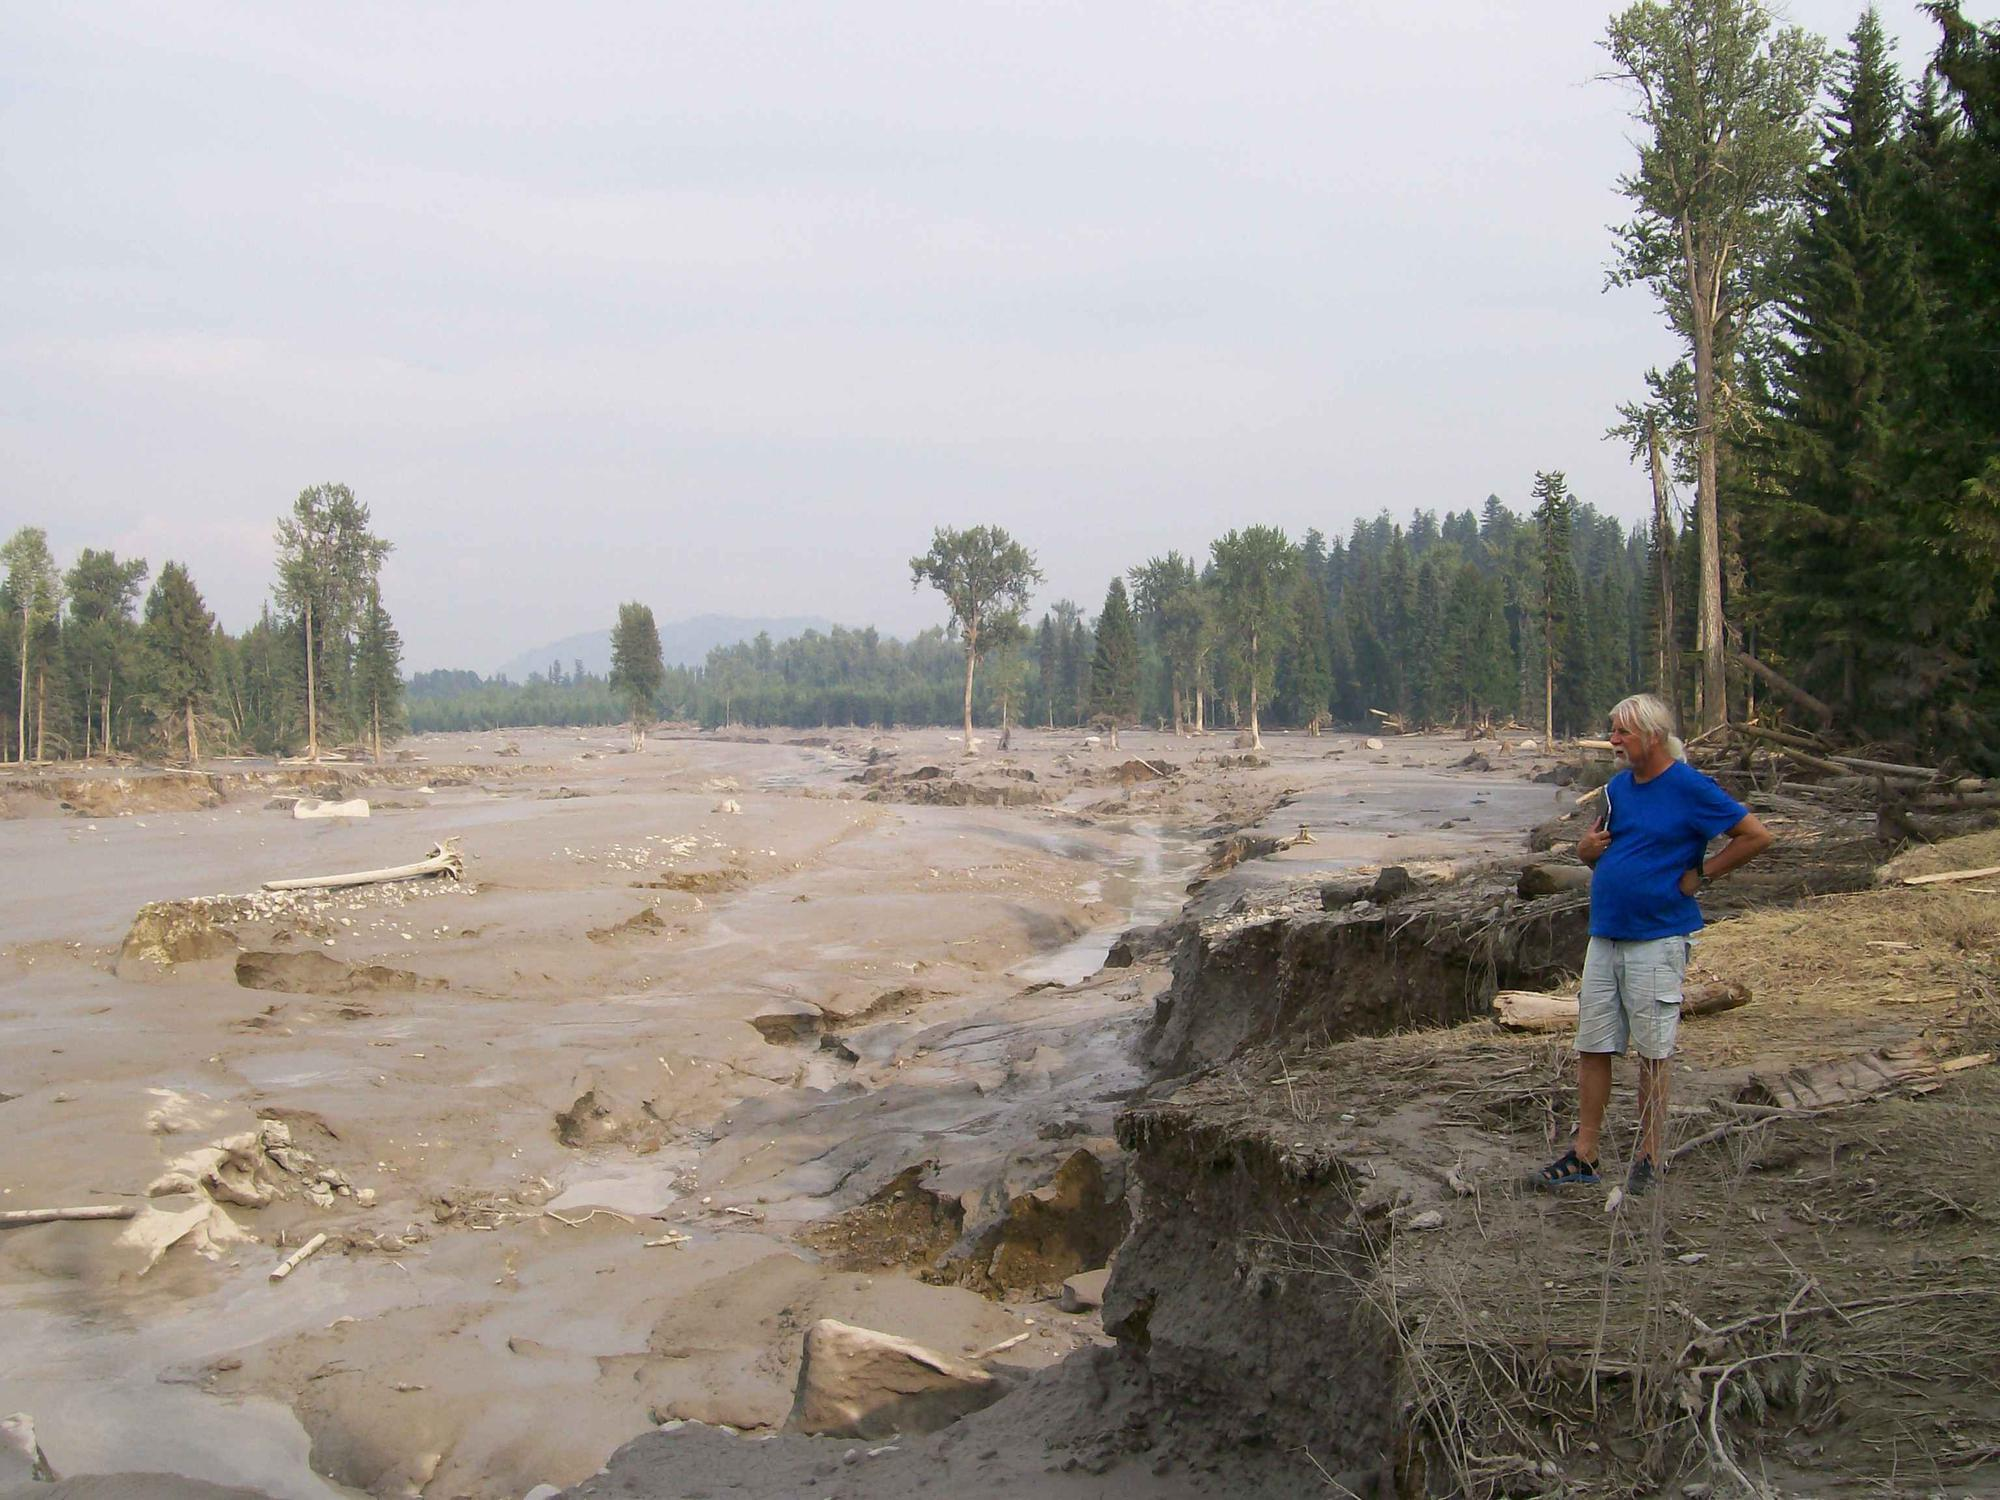 Hazeltine Creek after the spill (photo by Chris Blake)